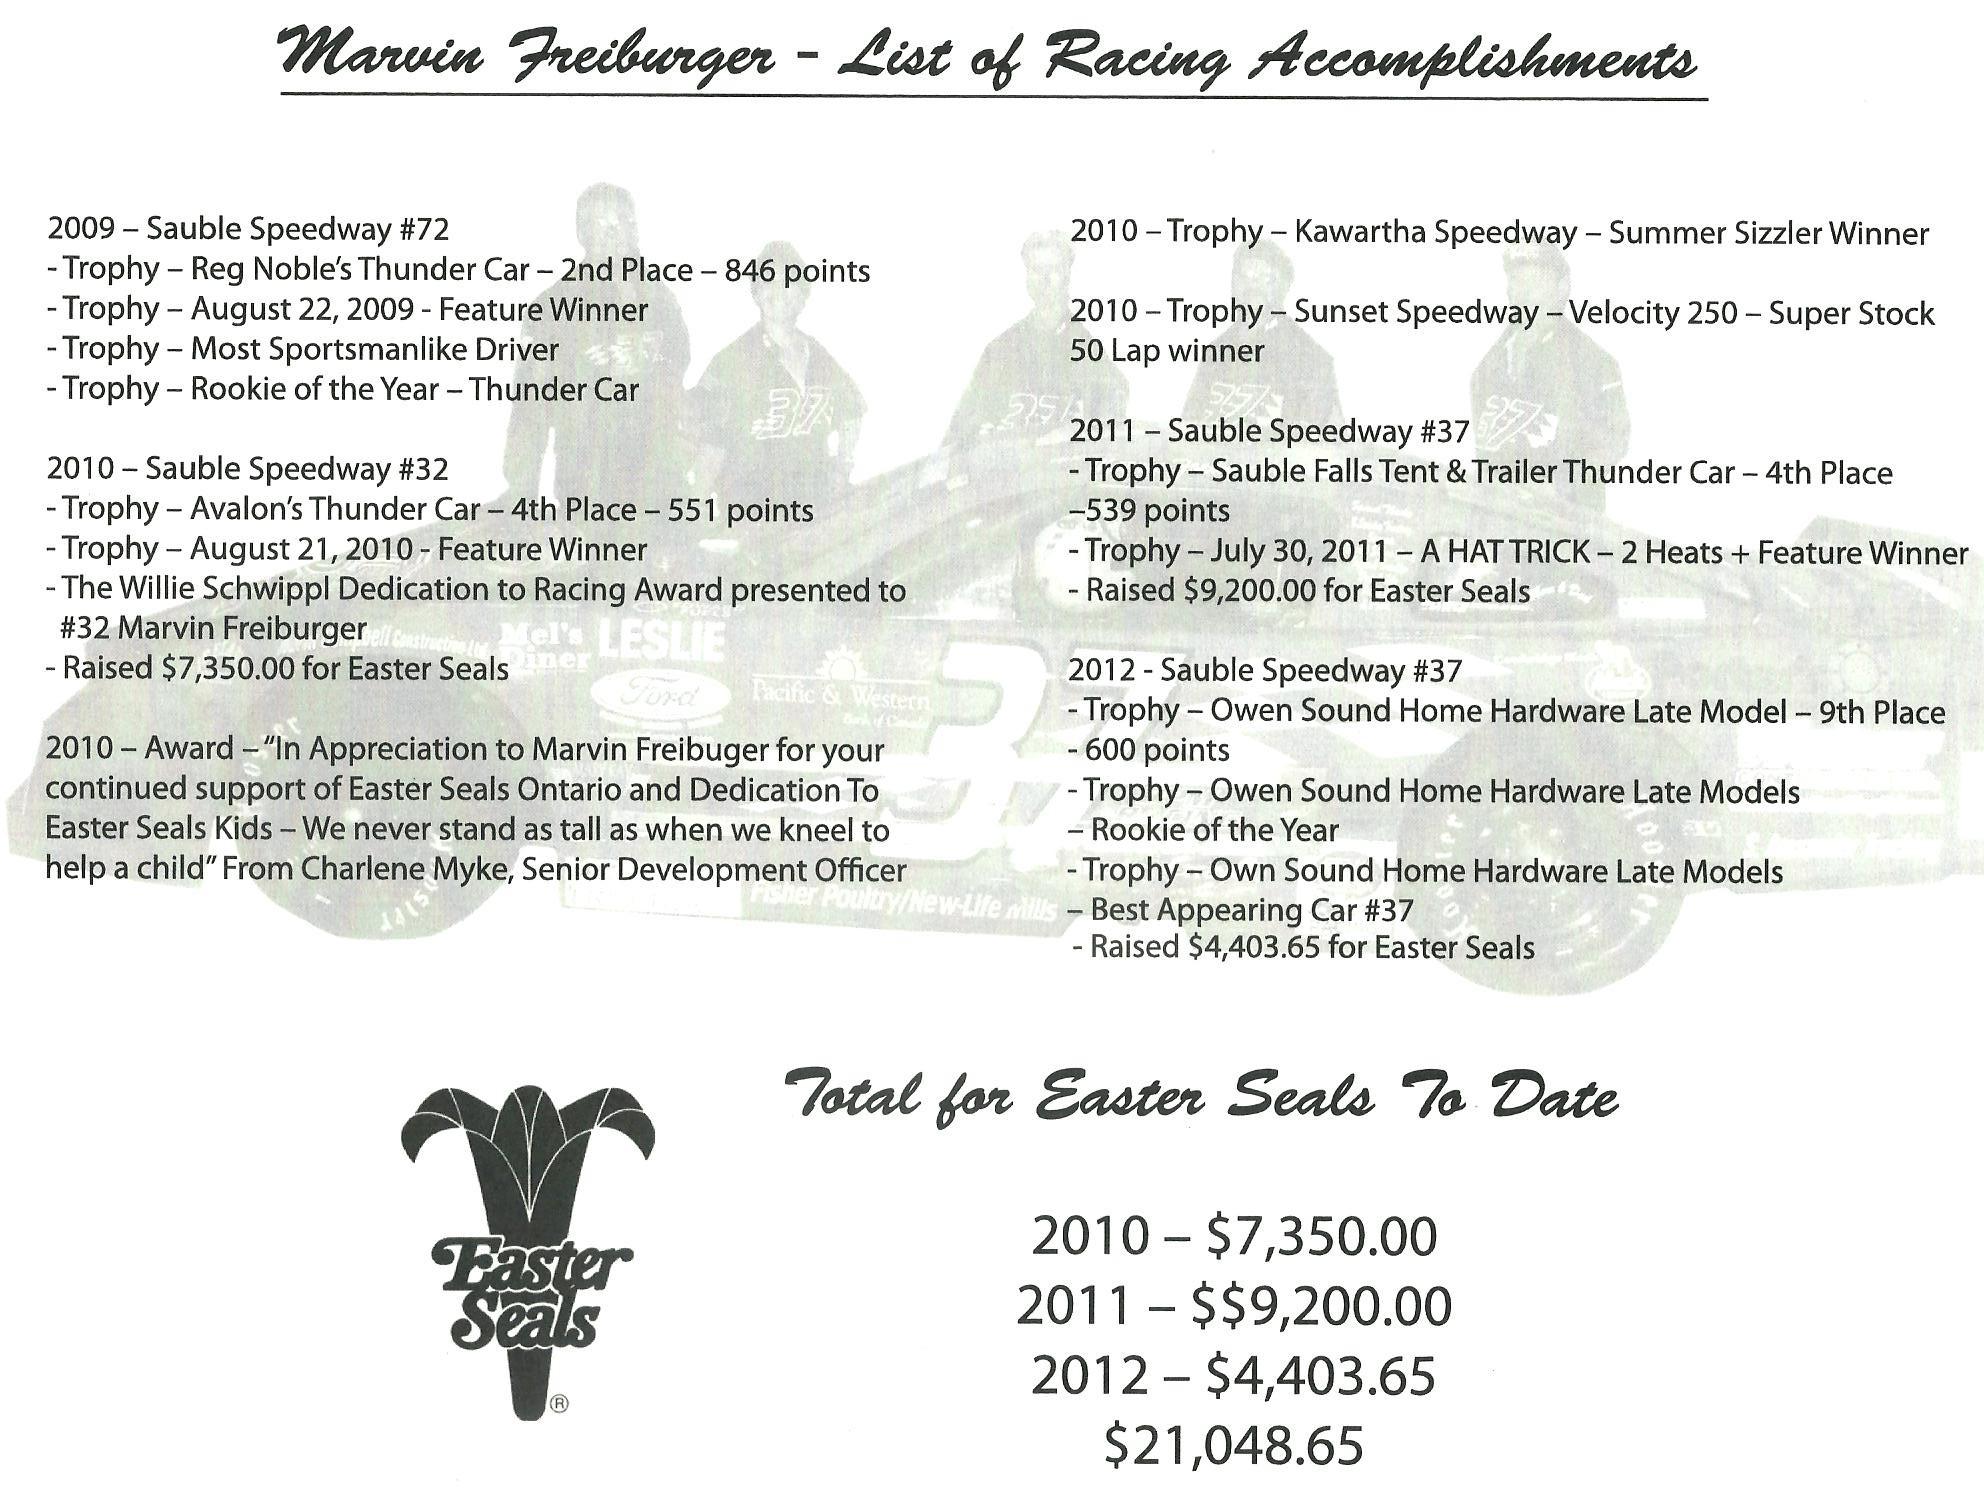 accomplishments marvin freiburger racing list of racing accomplishments up to dec 31 2012